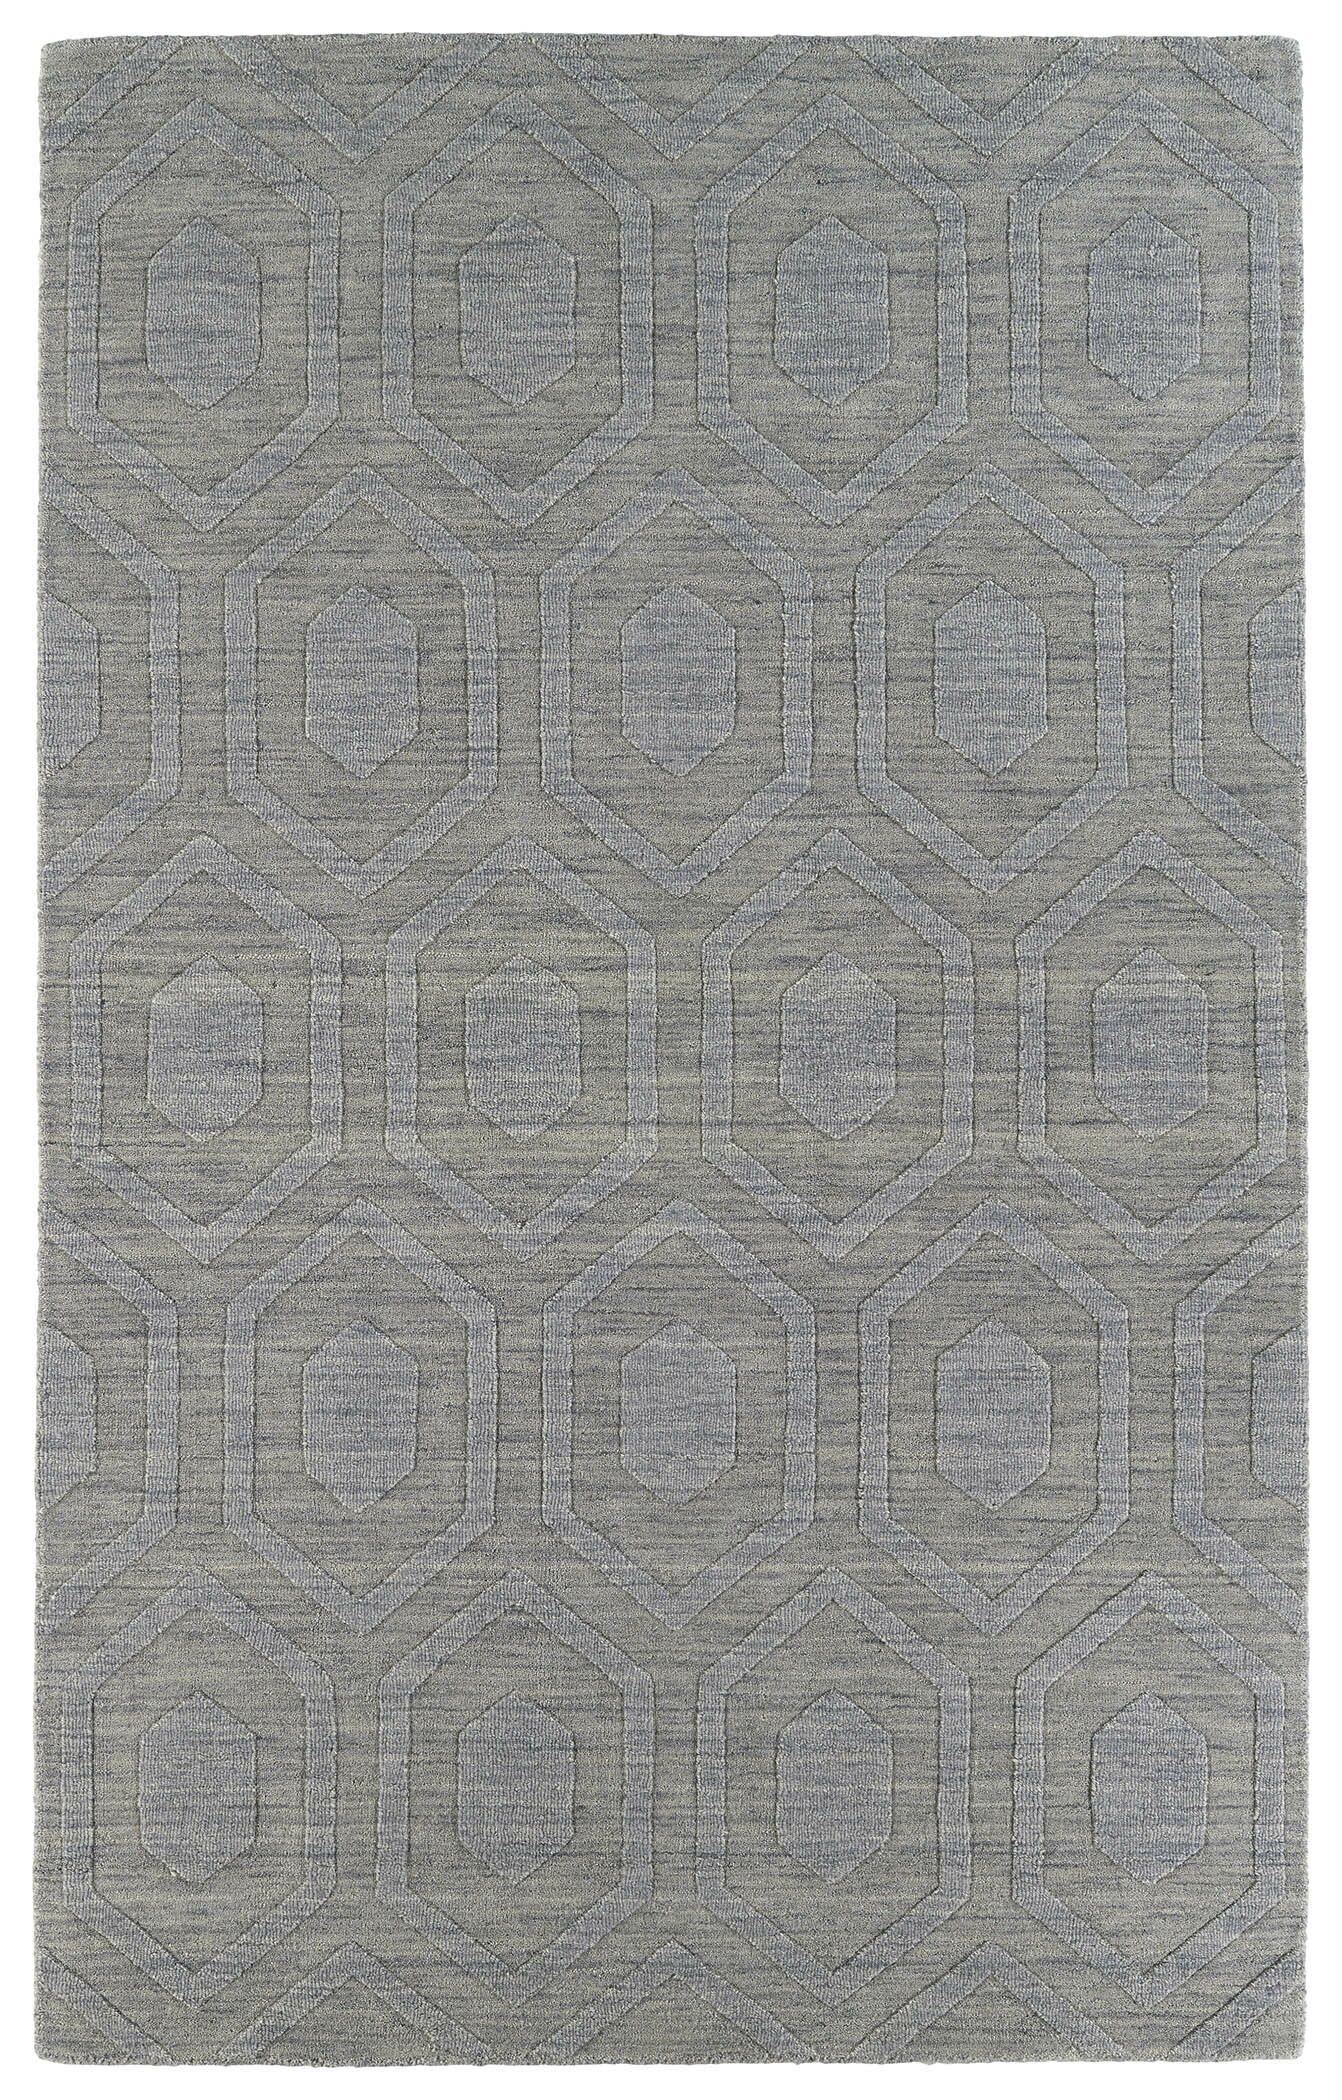 Dobson Steel Geometric Area Rug Rug Size: Rectangle 5' x 8'